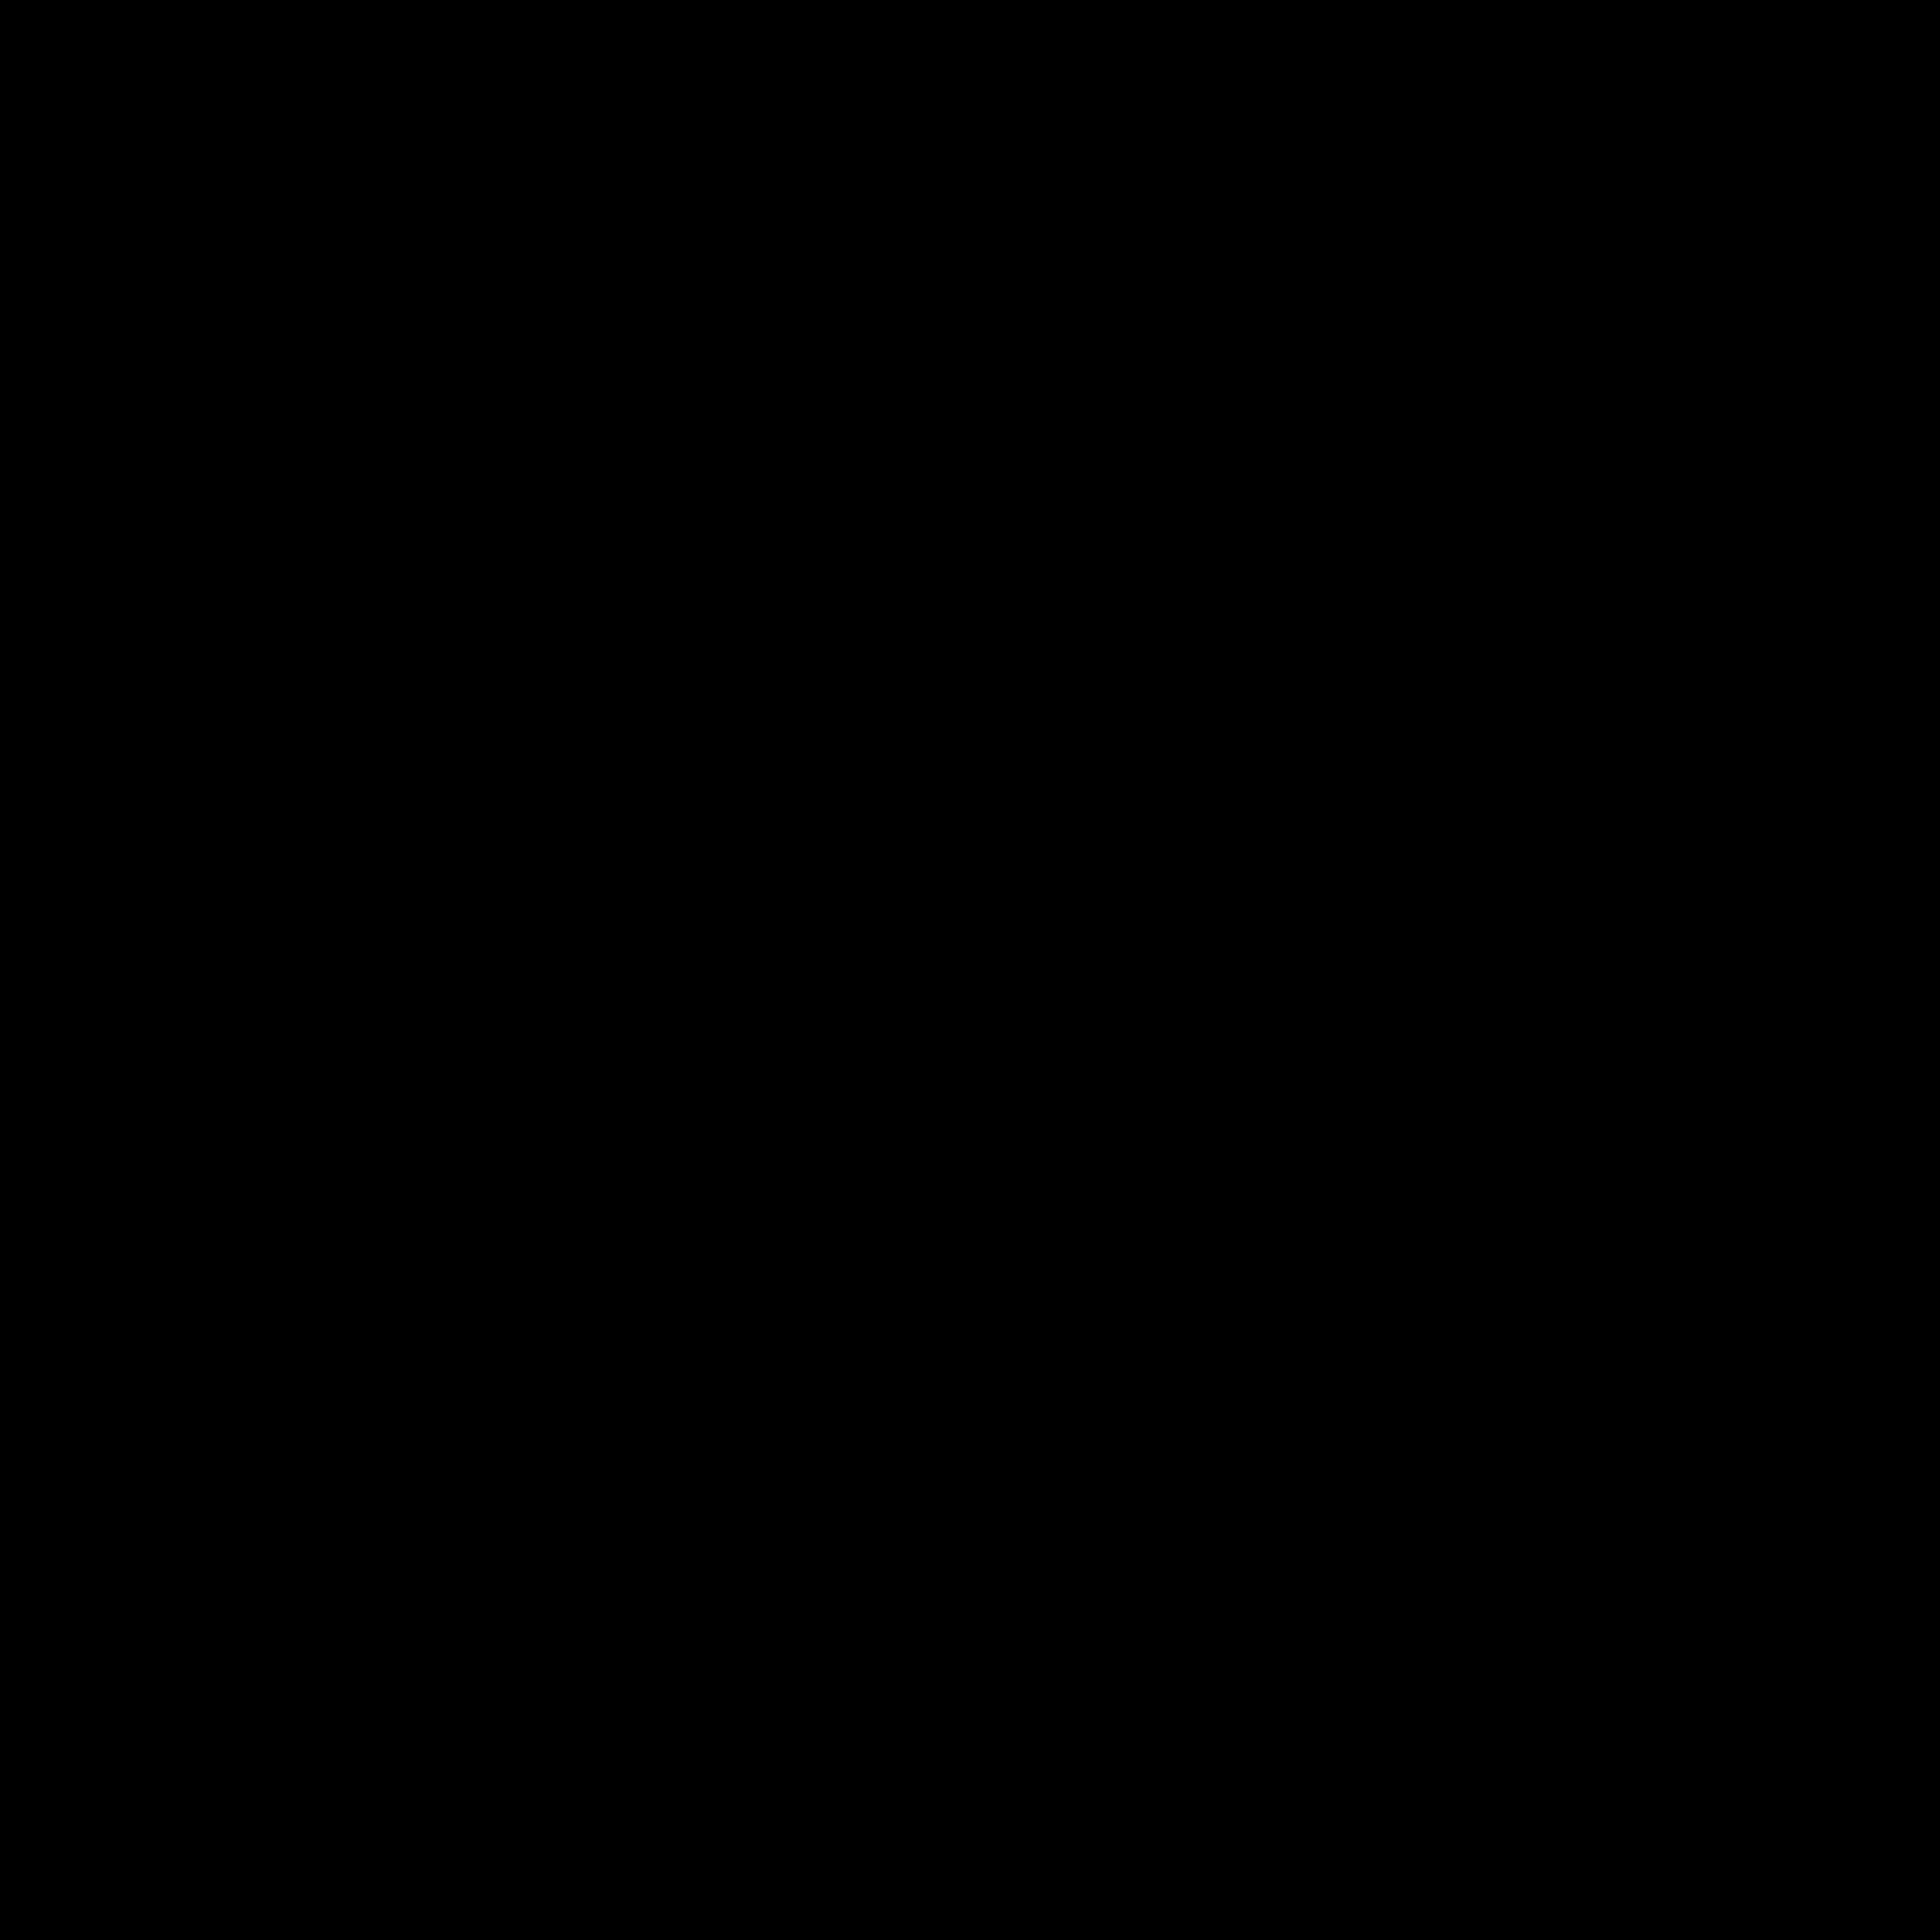 Ⓥ - Vegan Symbols / Emojis / Copyright-Free Clipart | Copy